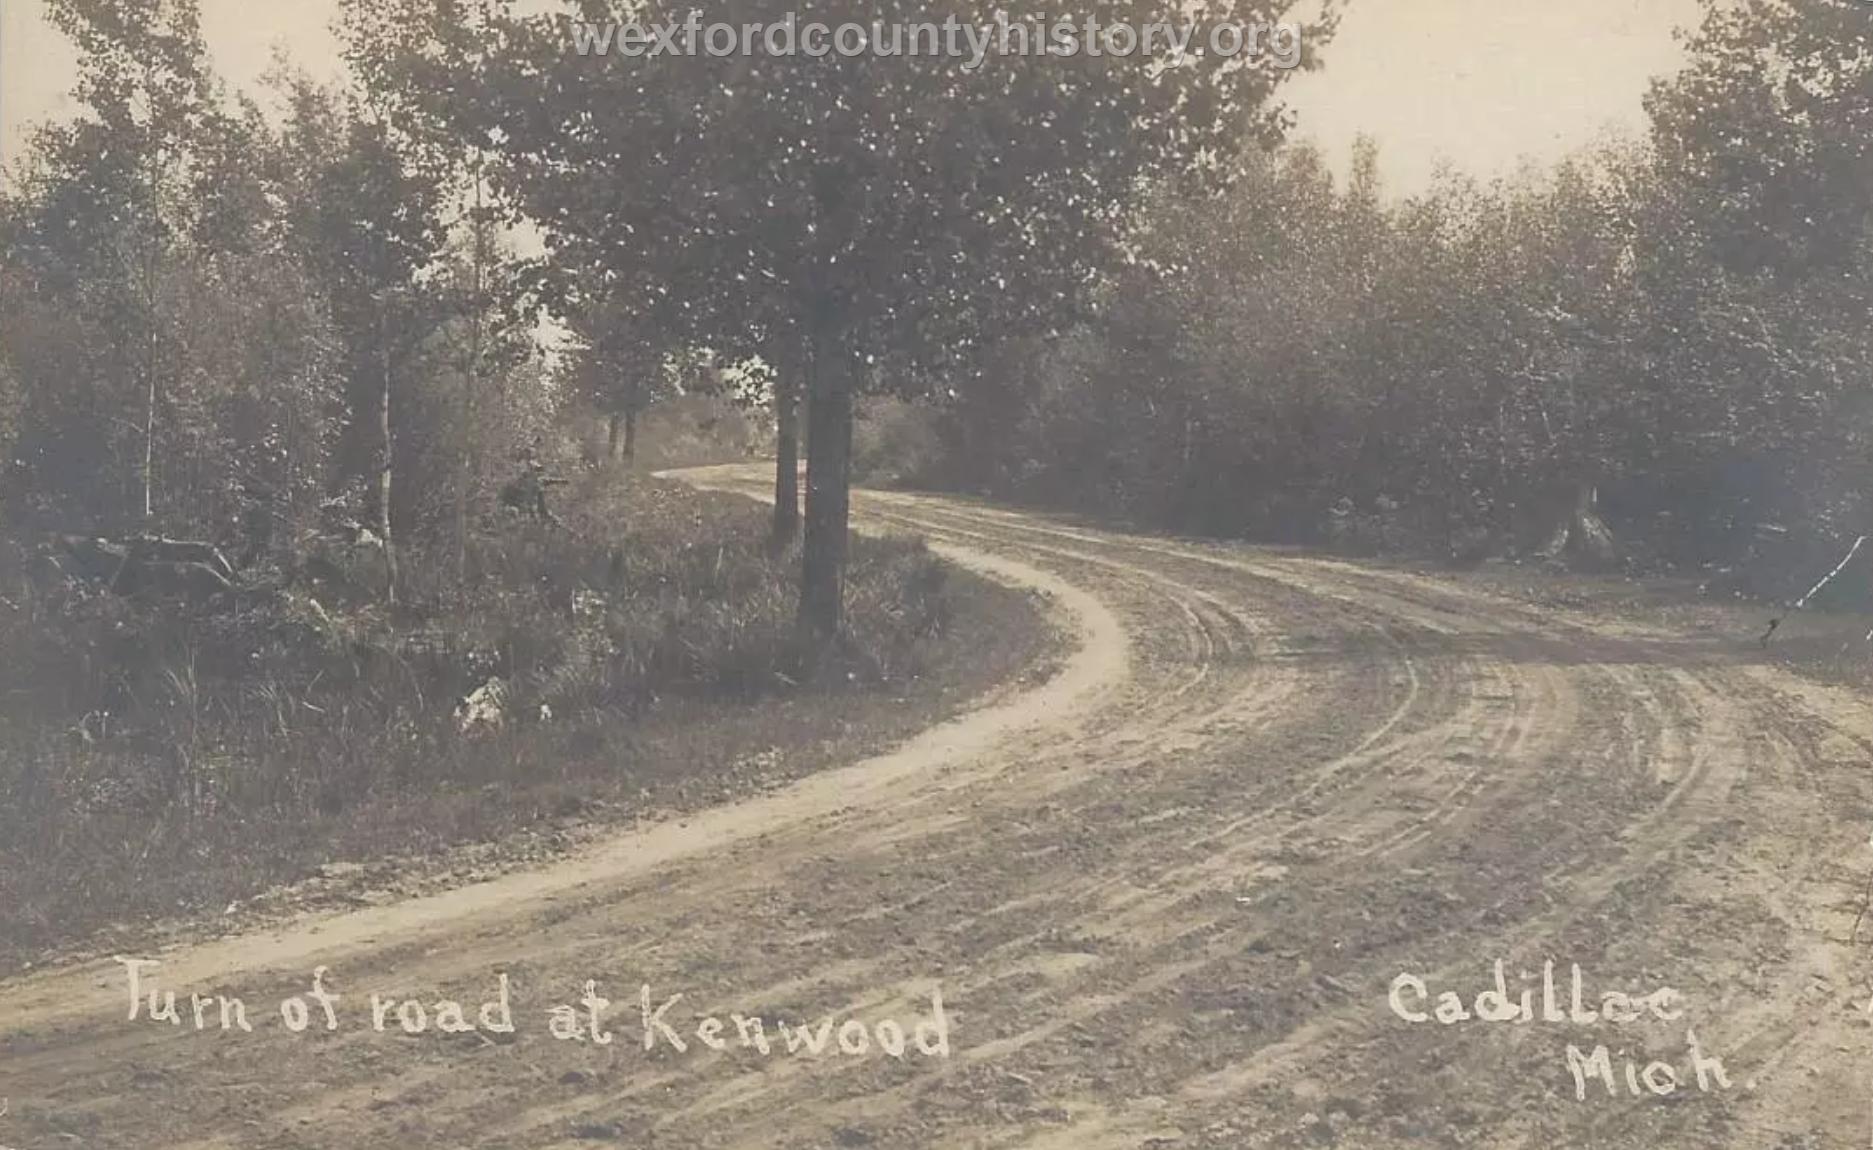 Cadillac-Recreation-Kenwood-Park-Area